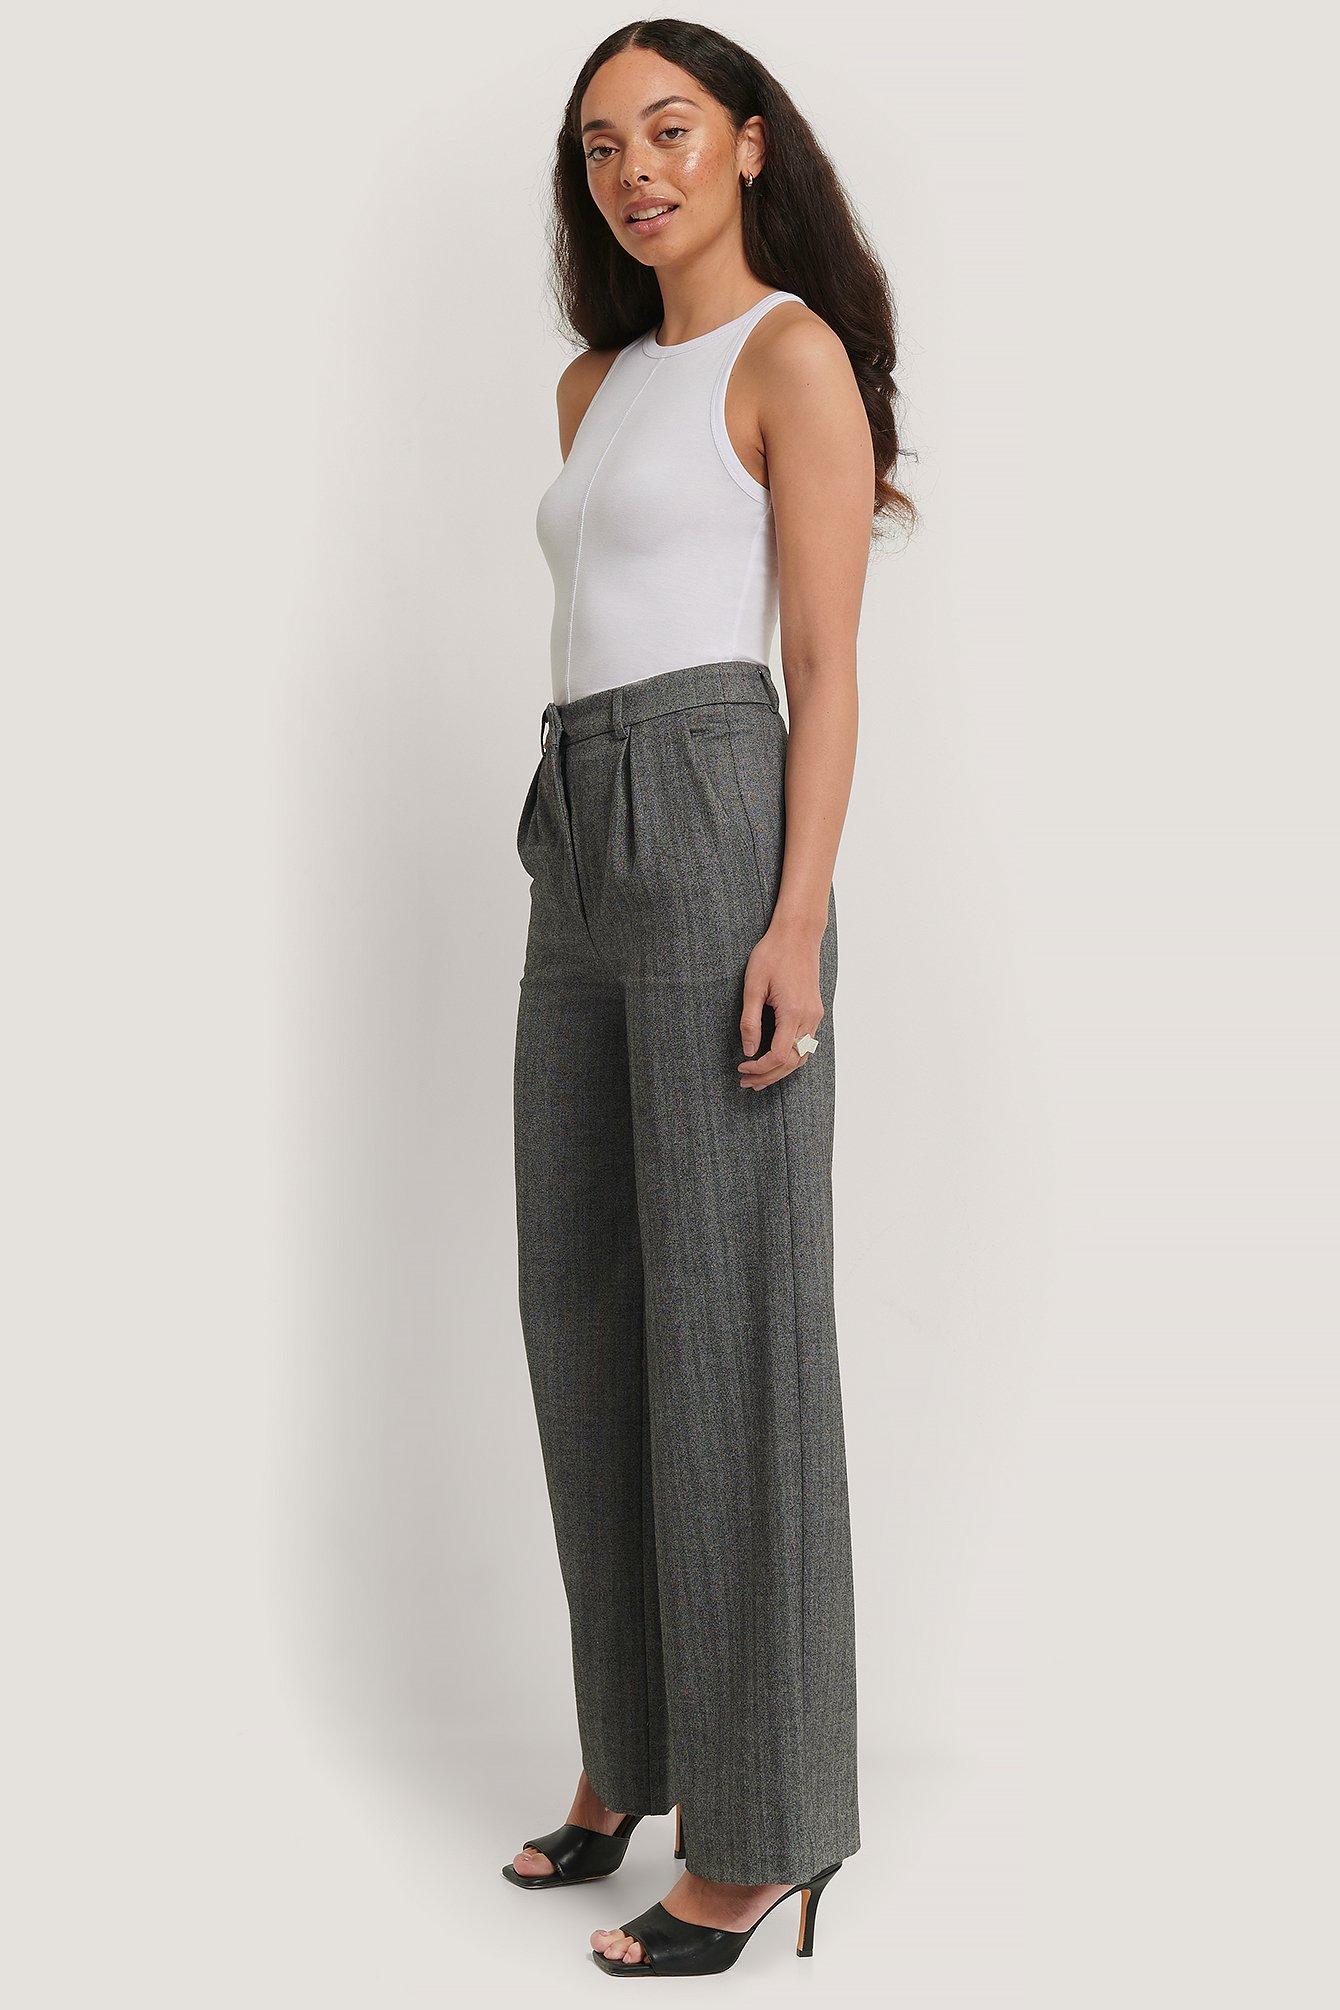 Tina Maria x NA-KD Weite Hose Aus Wollmischung - Grey | Bekleidung > Hosen > Weite Hosen | Tina Maria x NA-KD